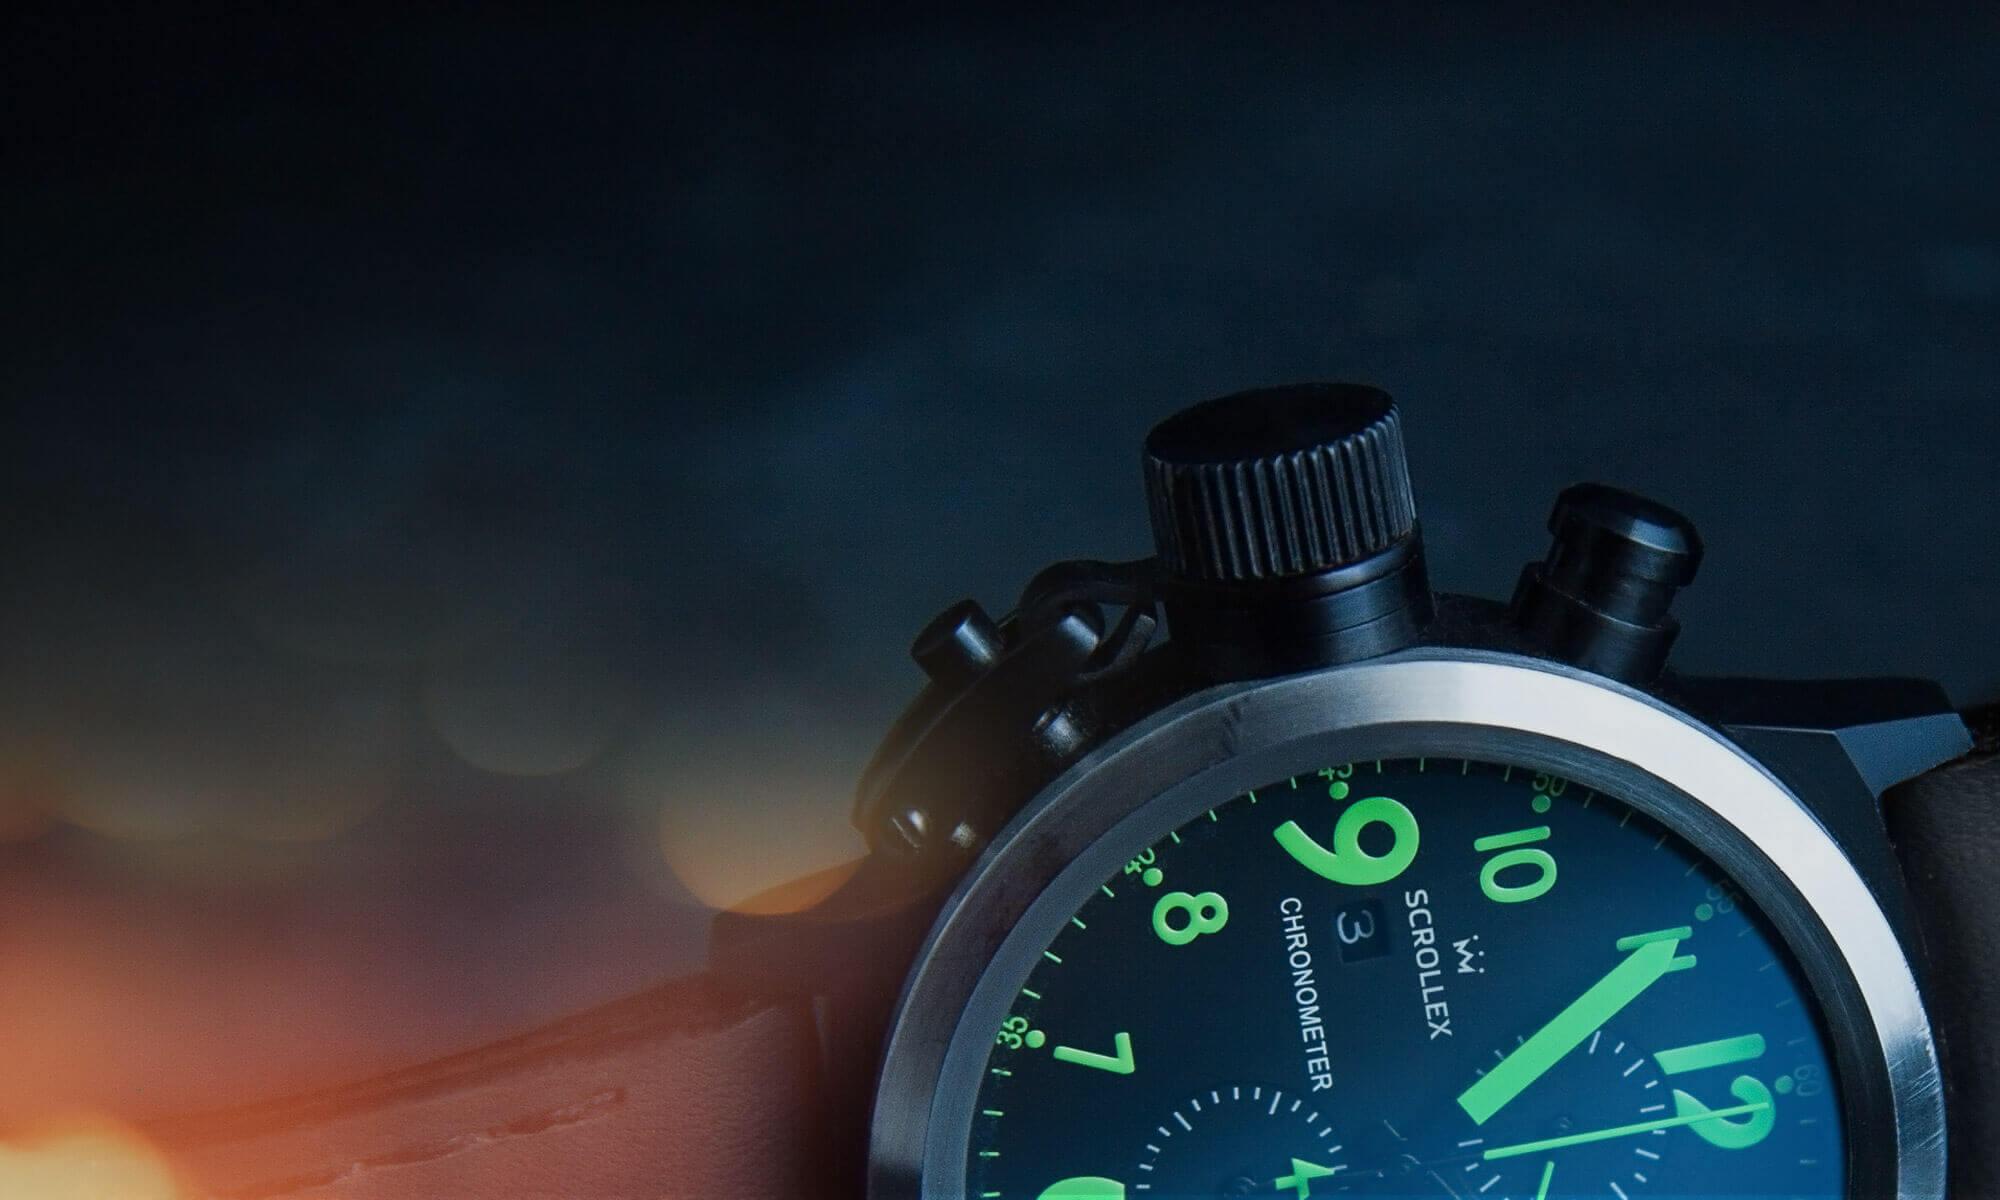 Scrollex-Back-Watch